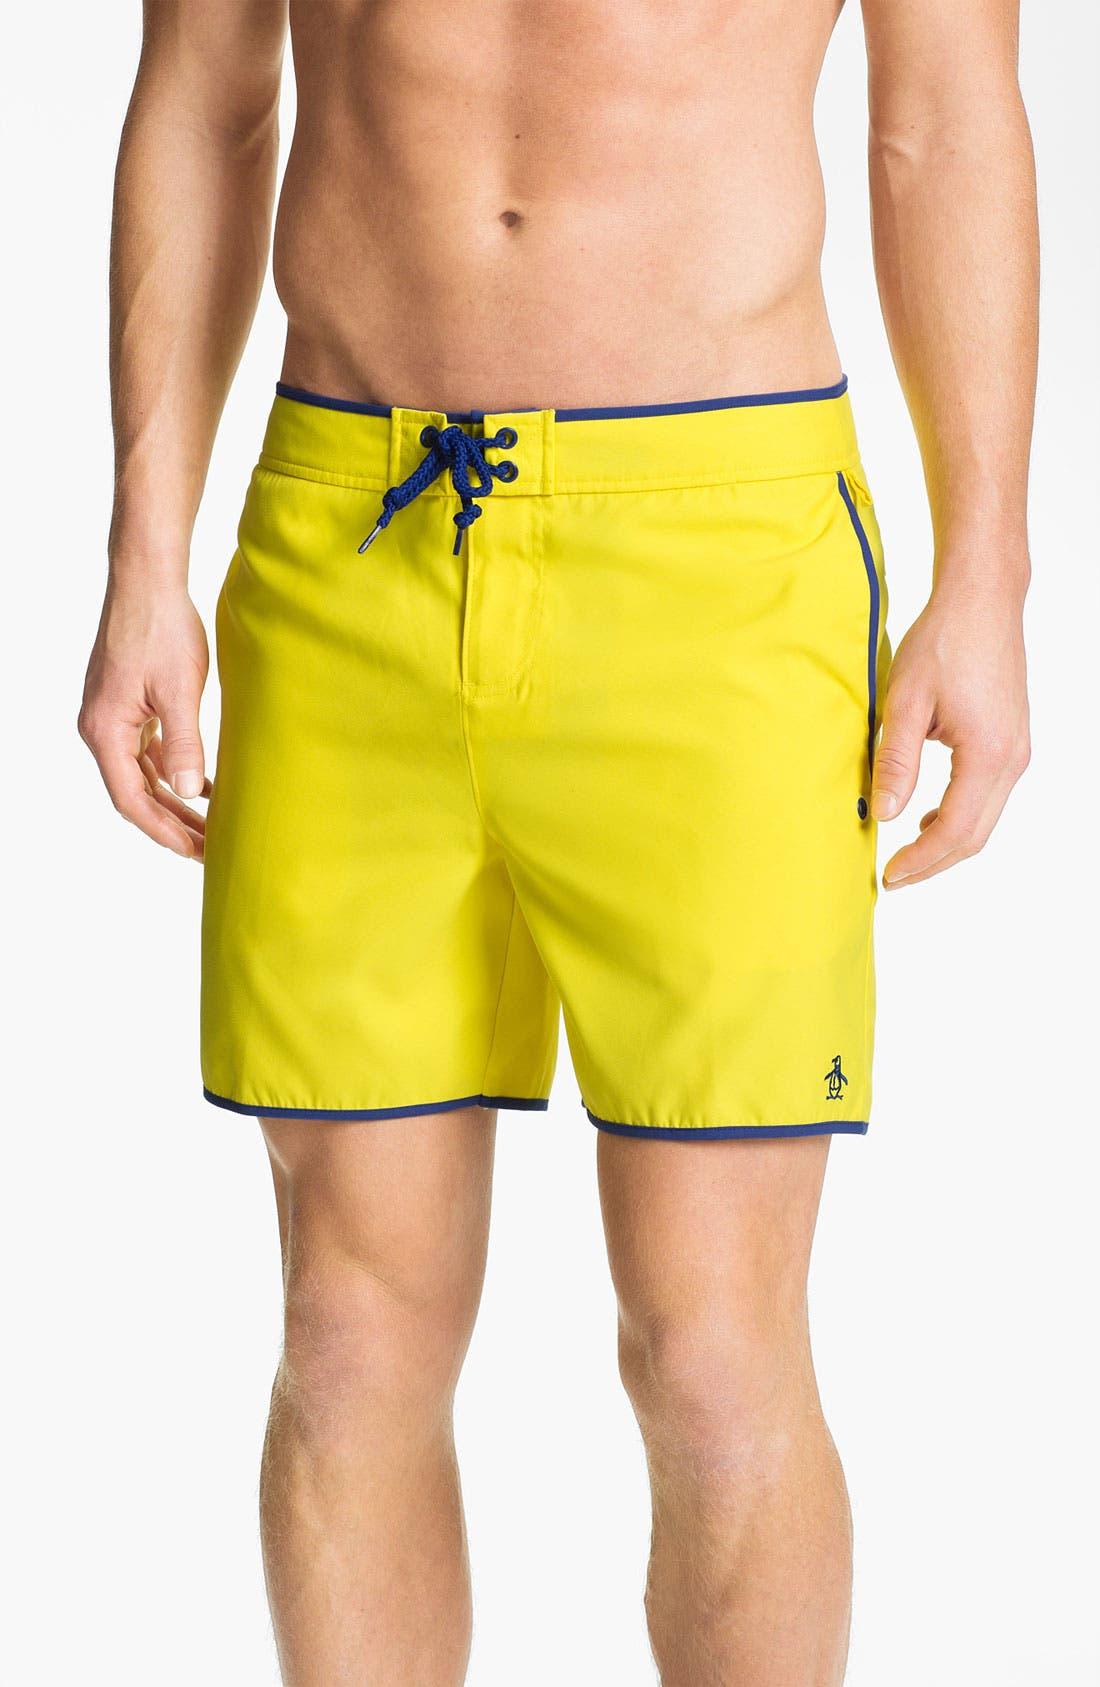 Alternate Image 1 Selected - Original Penguin Swim Shorts